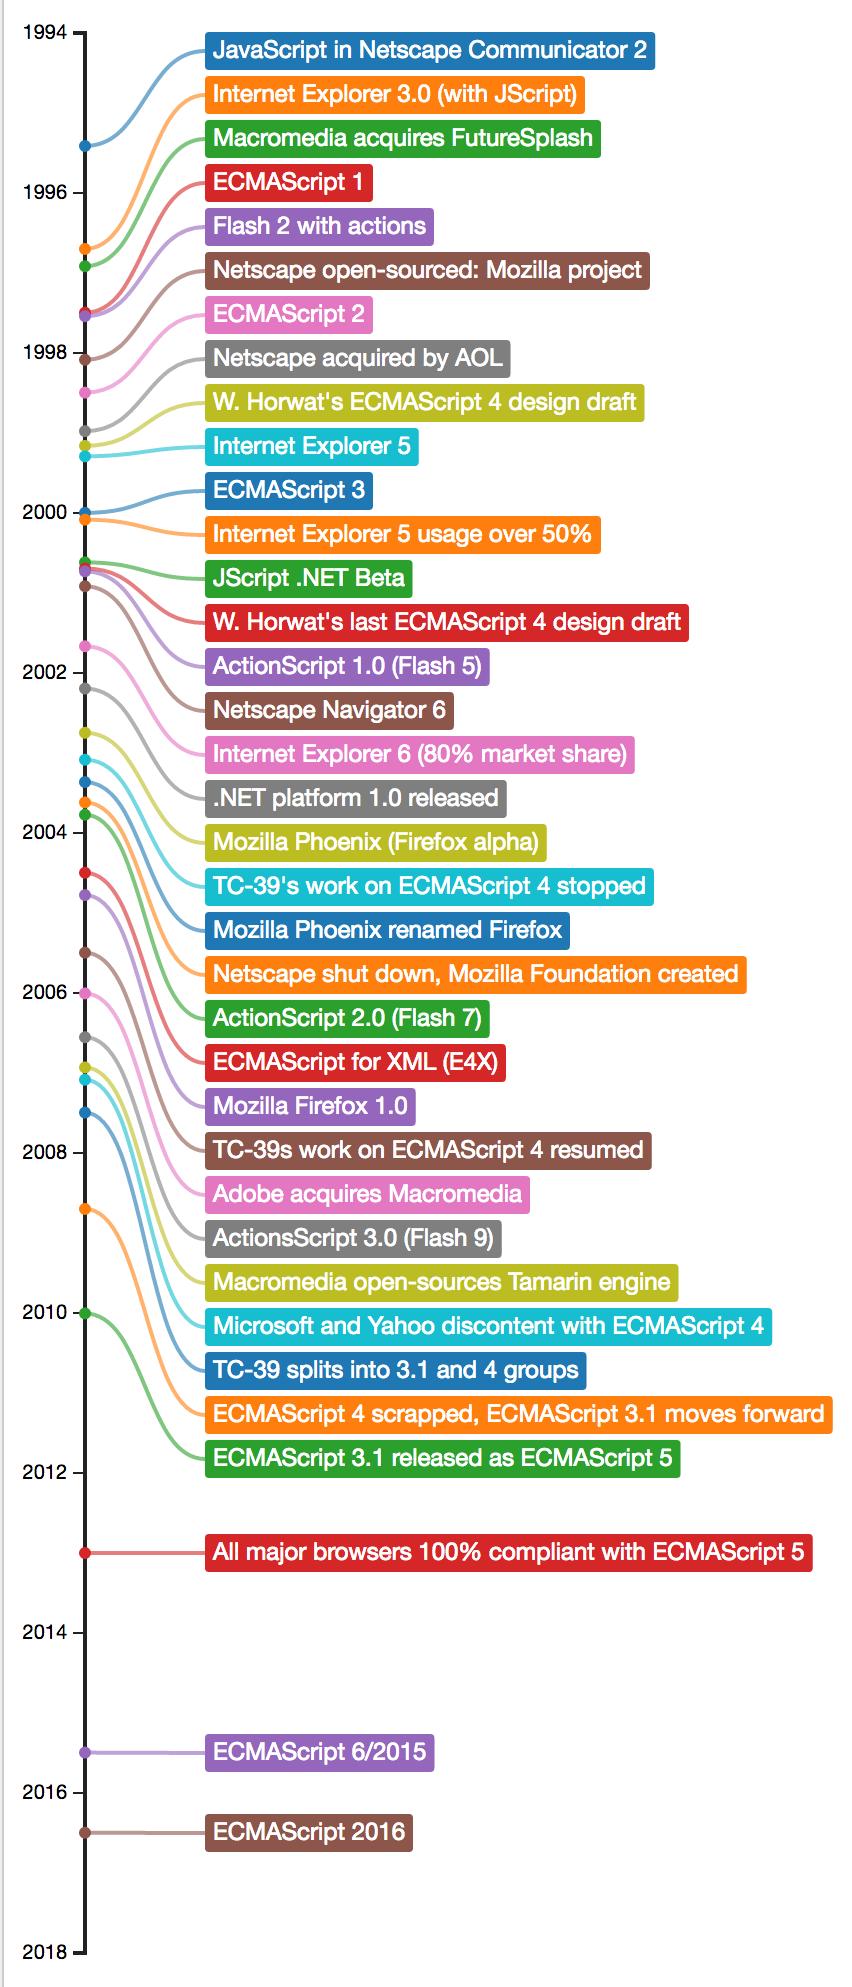 ECMAScript history timeline